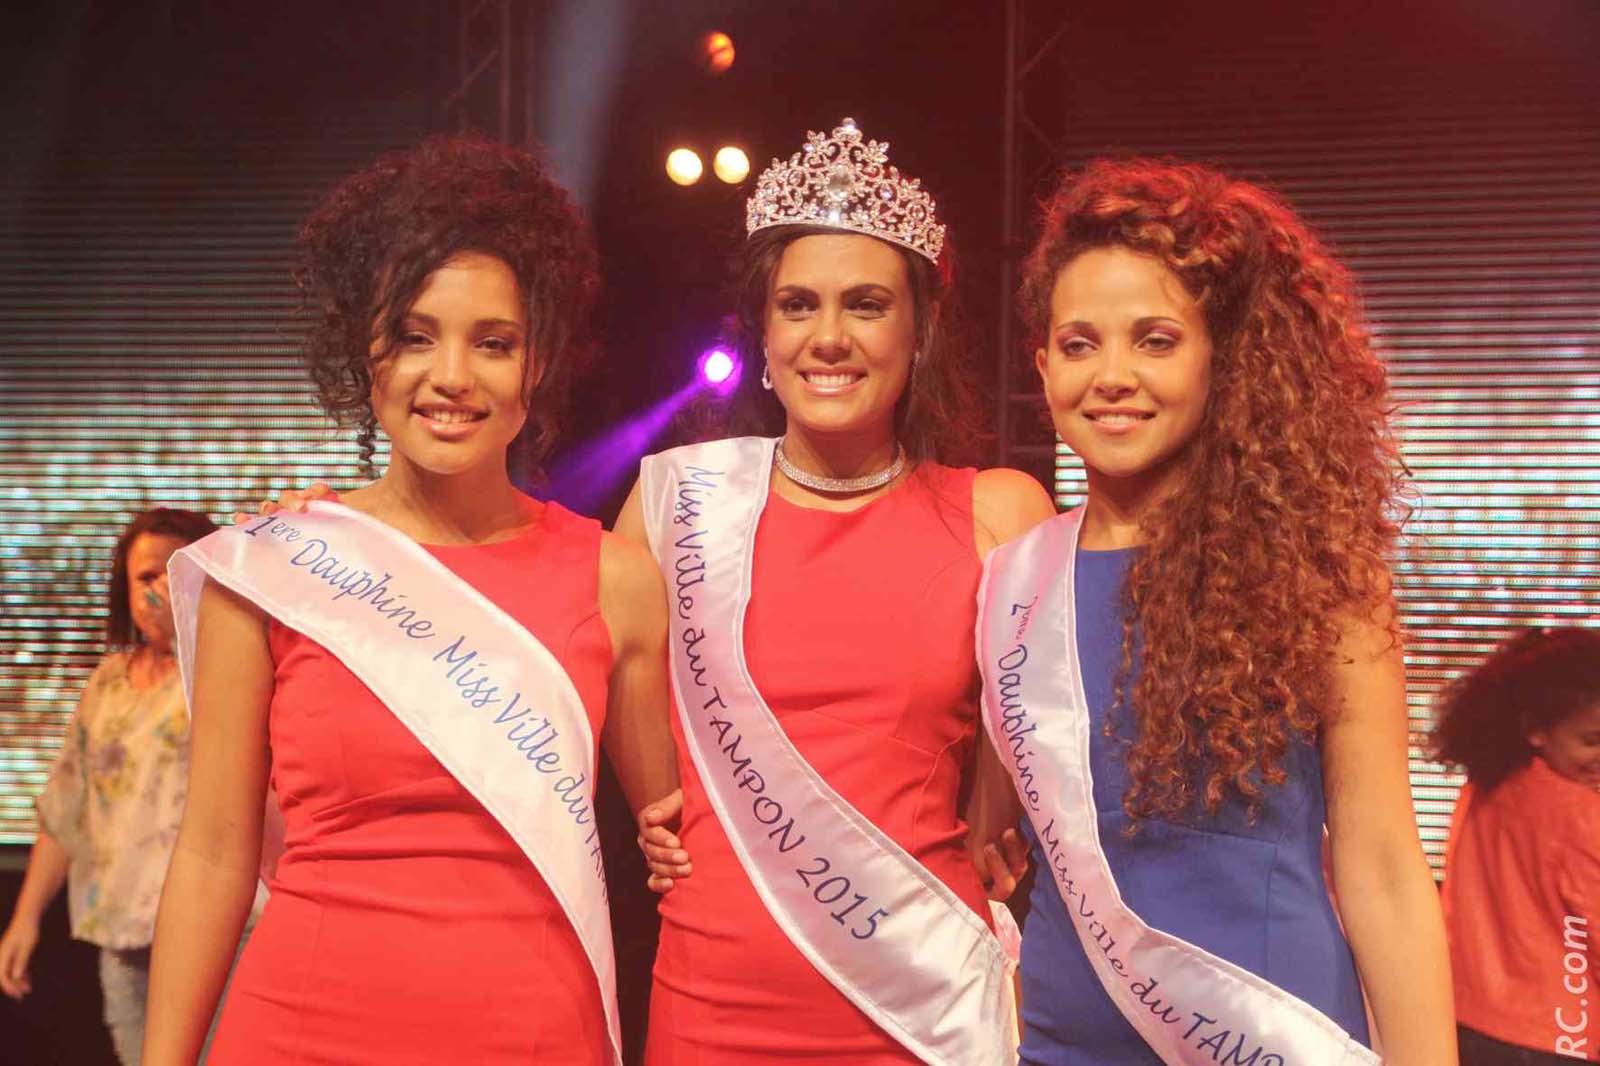 Marine Fontaine, 1ère dauphine, Anaïs Picard, Miss Ville du Tampon, et Kimberley Gigan, 2ème dauphine